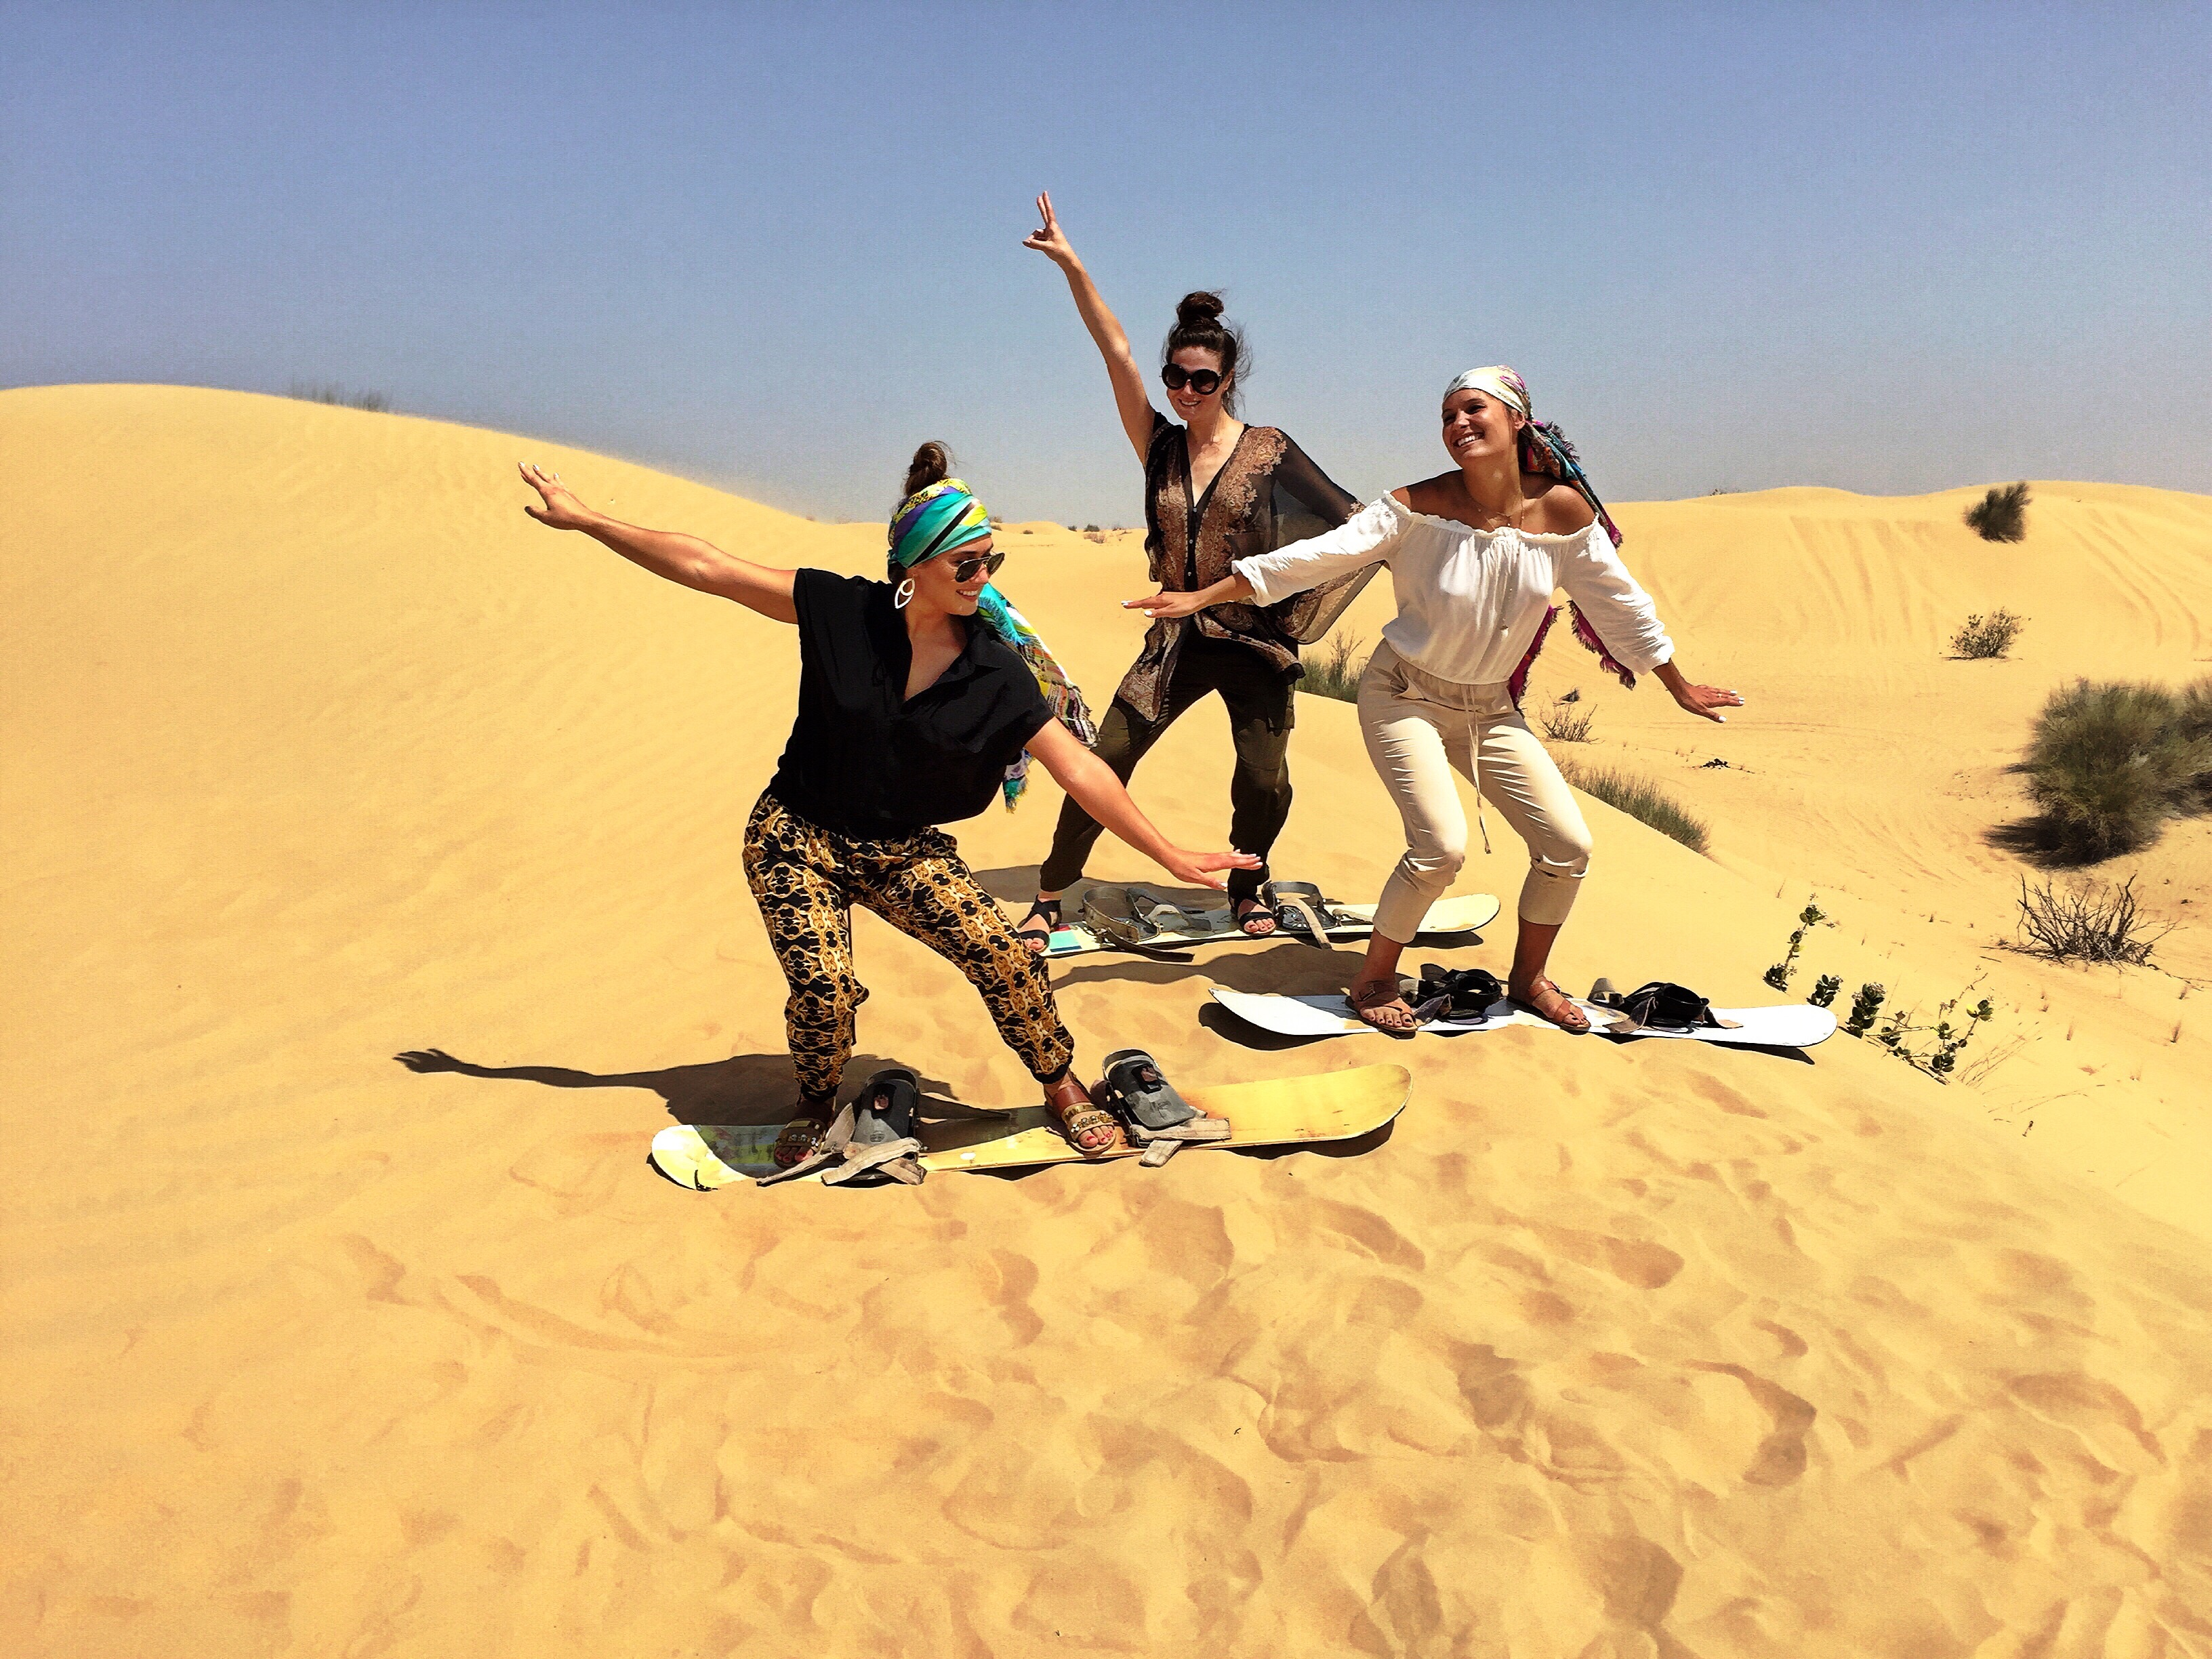 sand-boarding-dubai